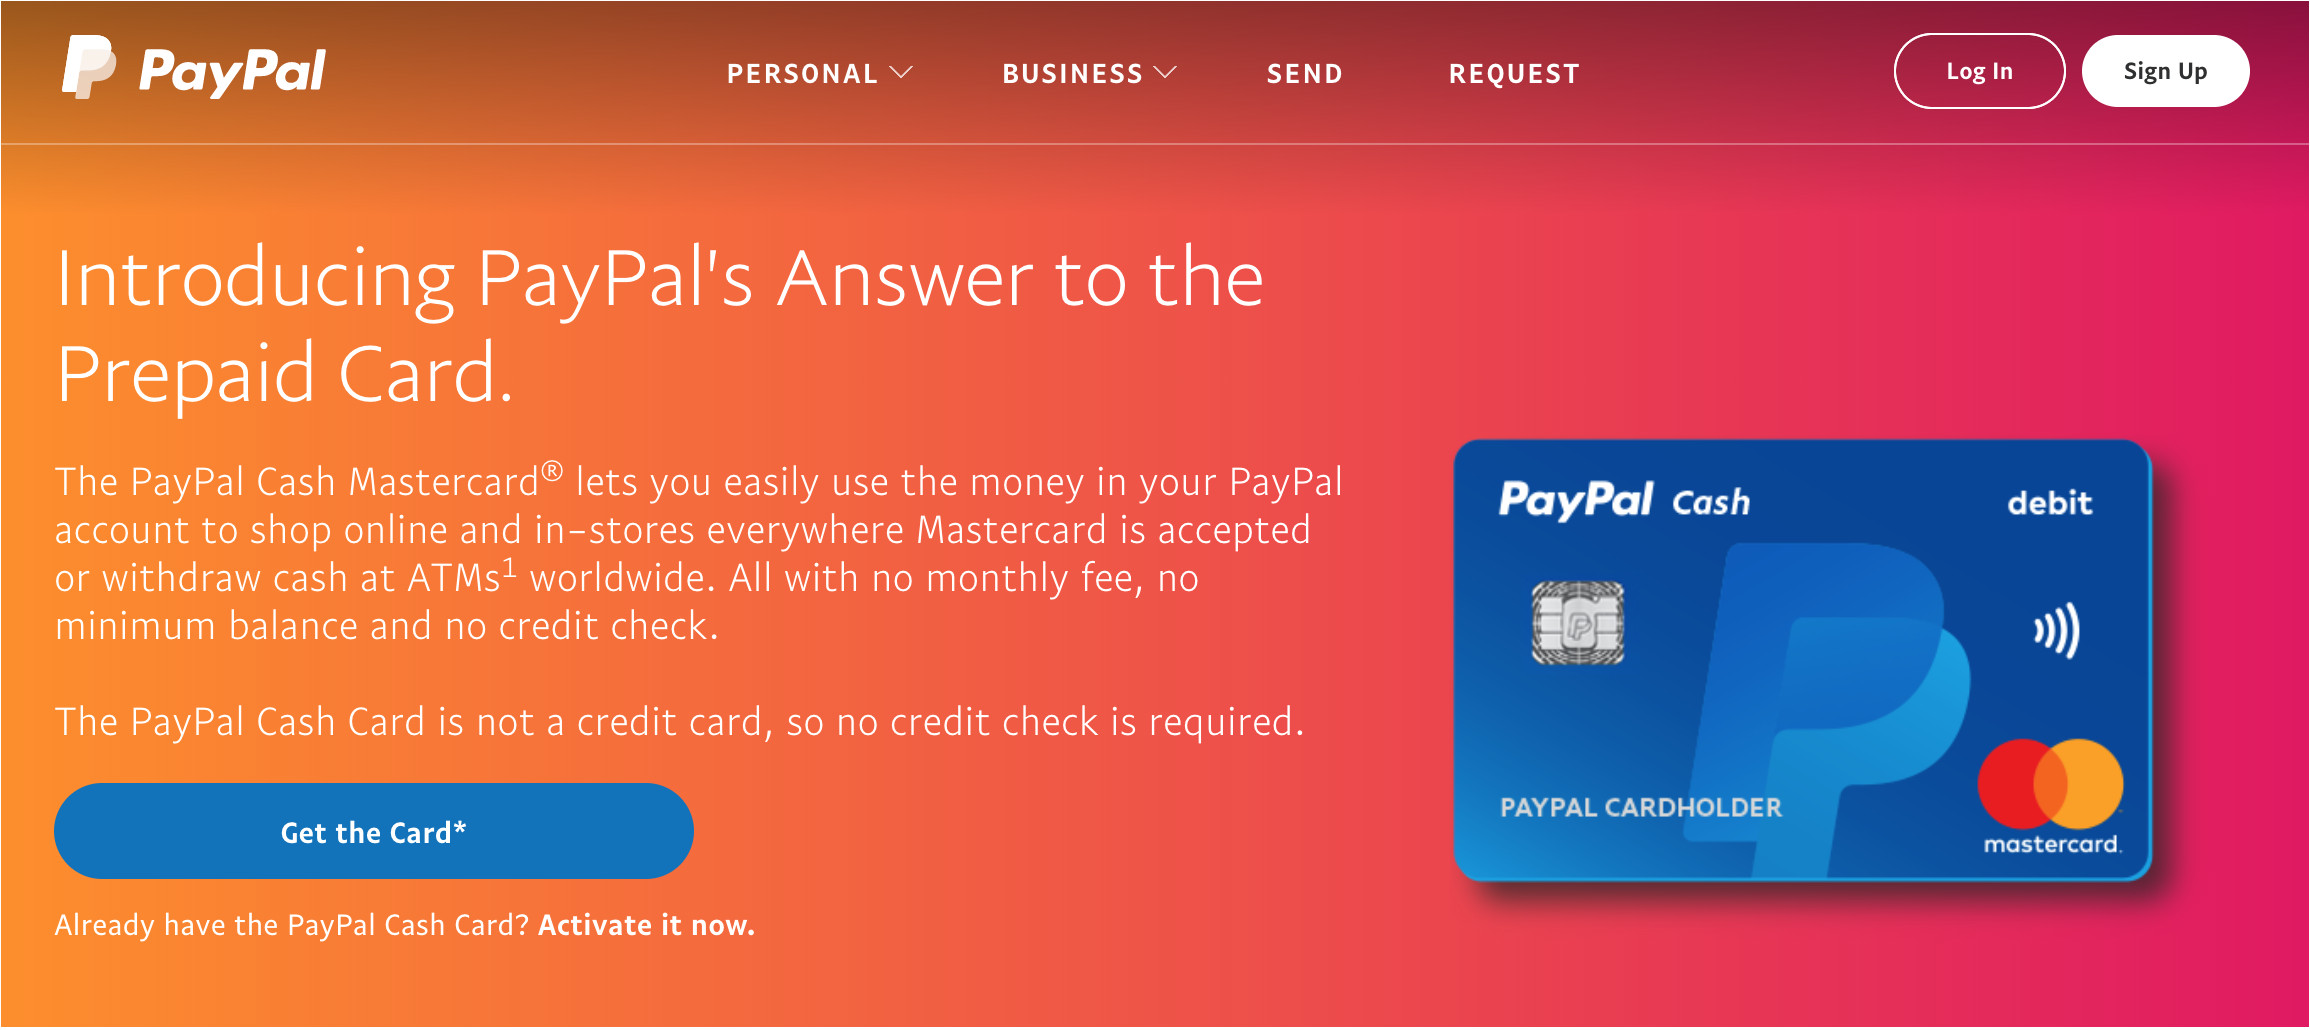 paypal cash mastercard